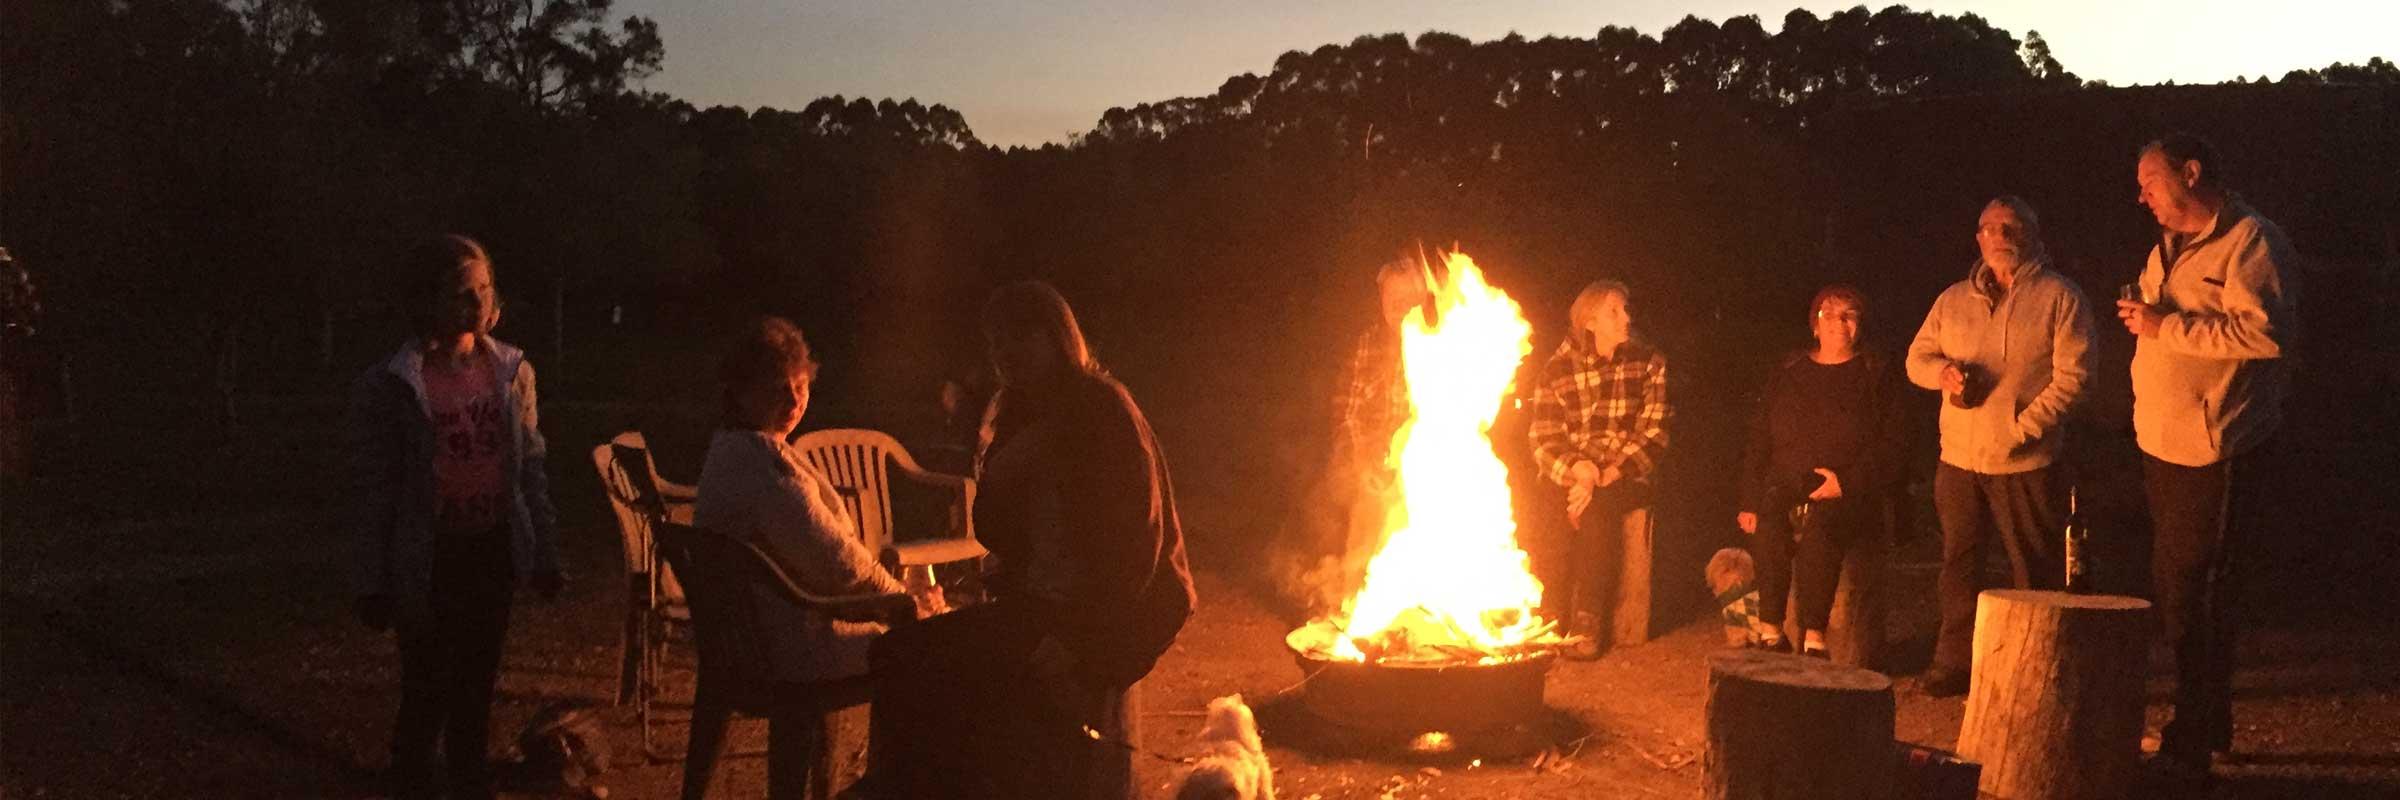 Evening-Campfire